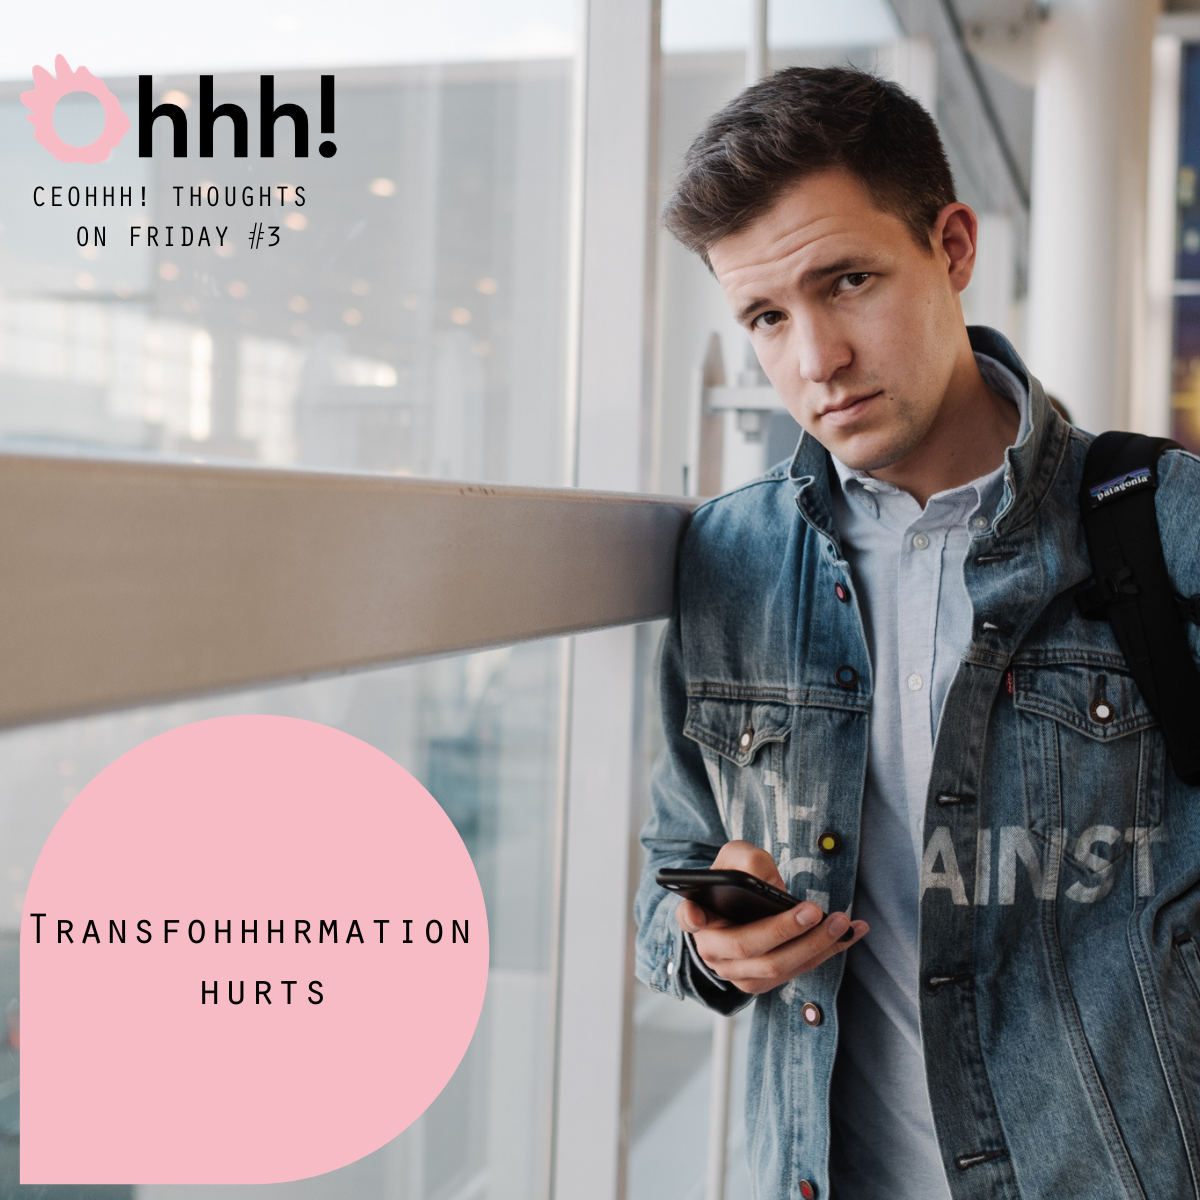 Transfohhhrmation hurts